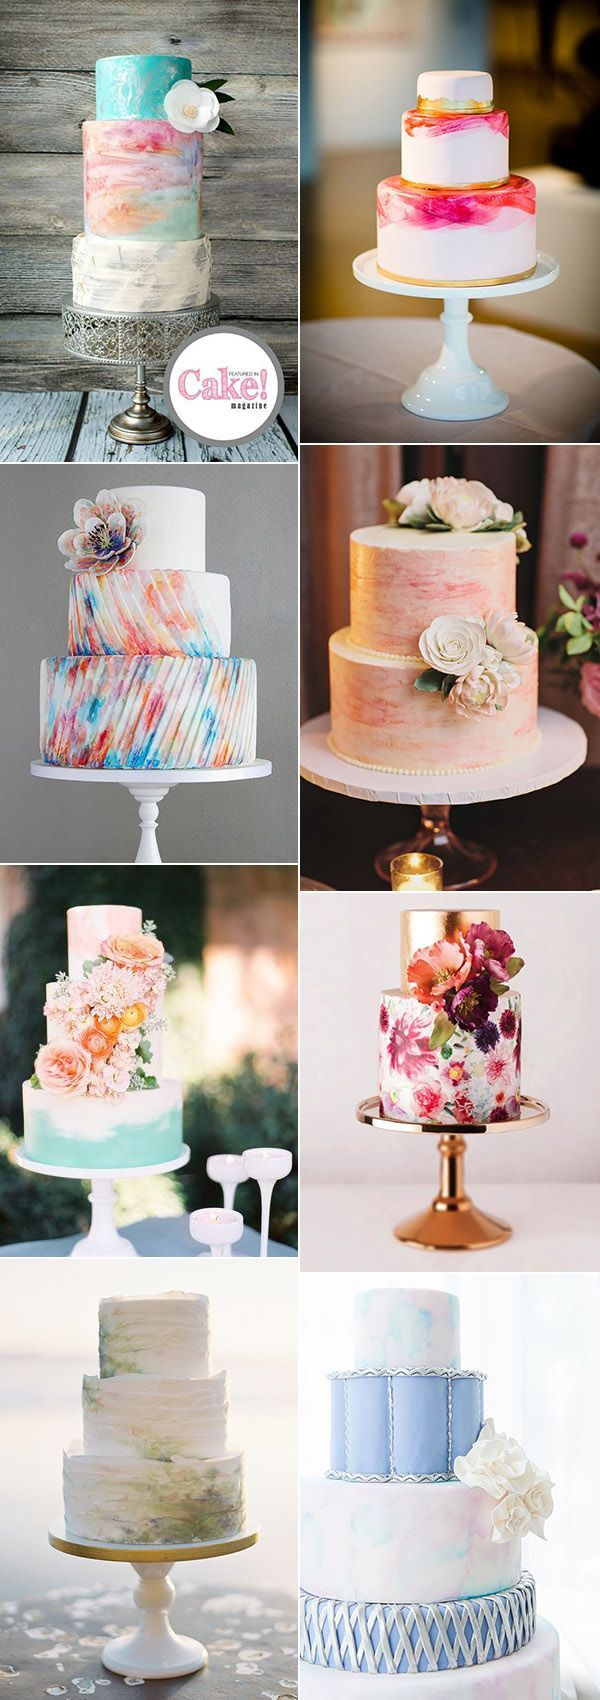 glamorous watercolor wedding cakes for romantic wedding ideas